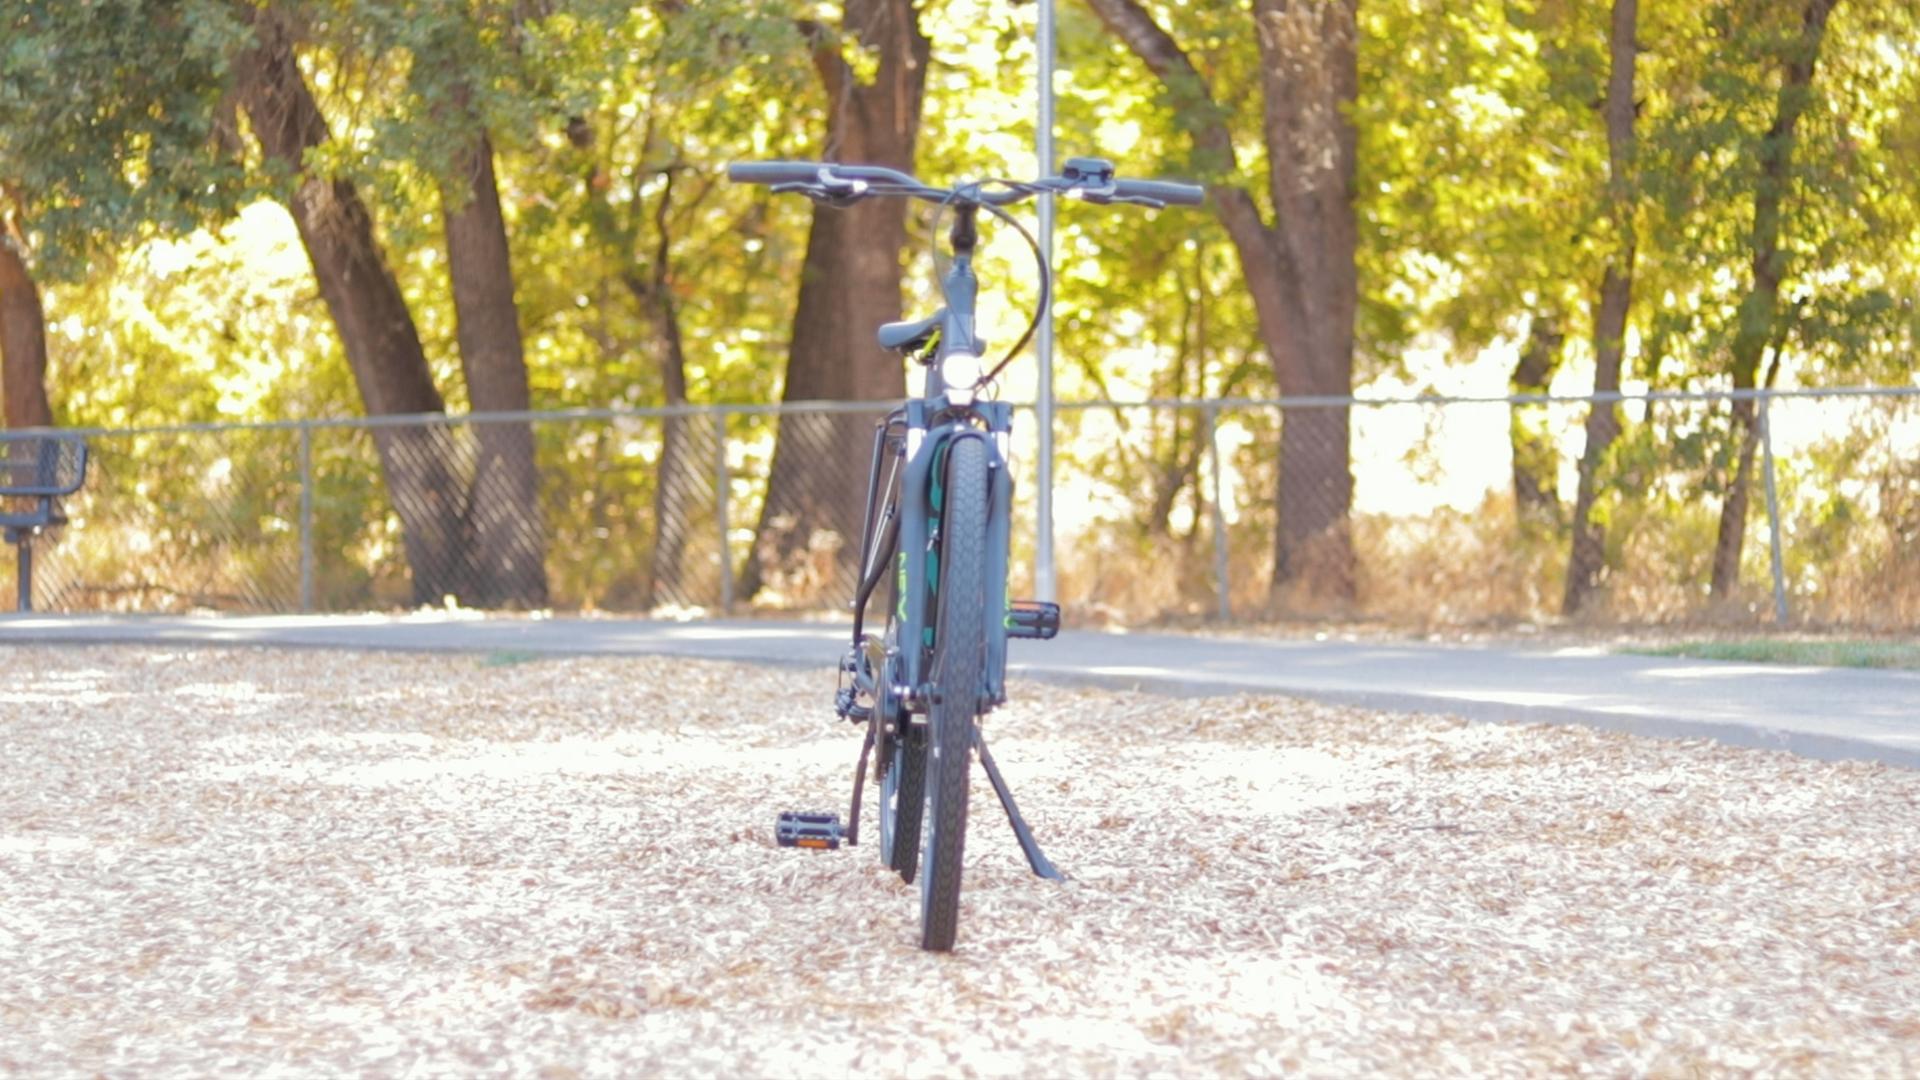 electrified-reviews-izip-e3-brio-electric-bike-review-front.jpg